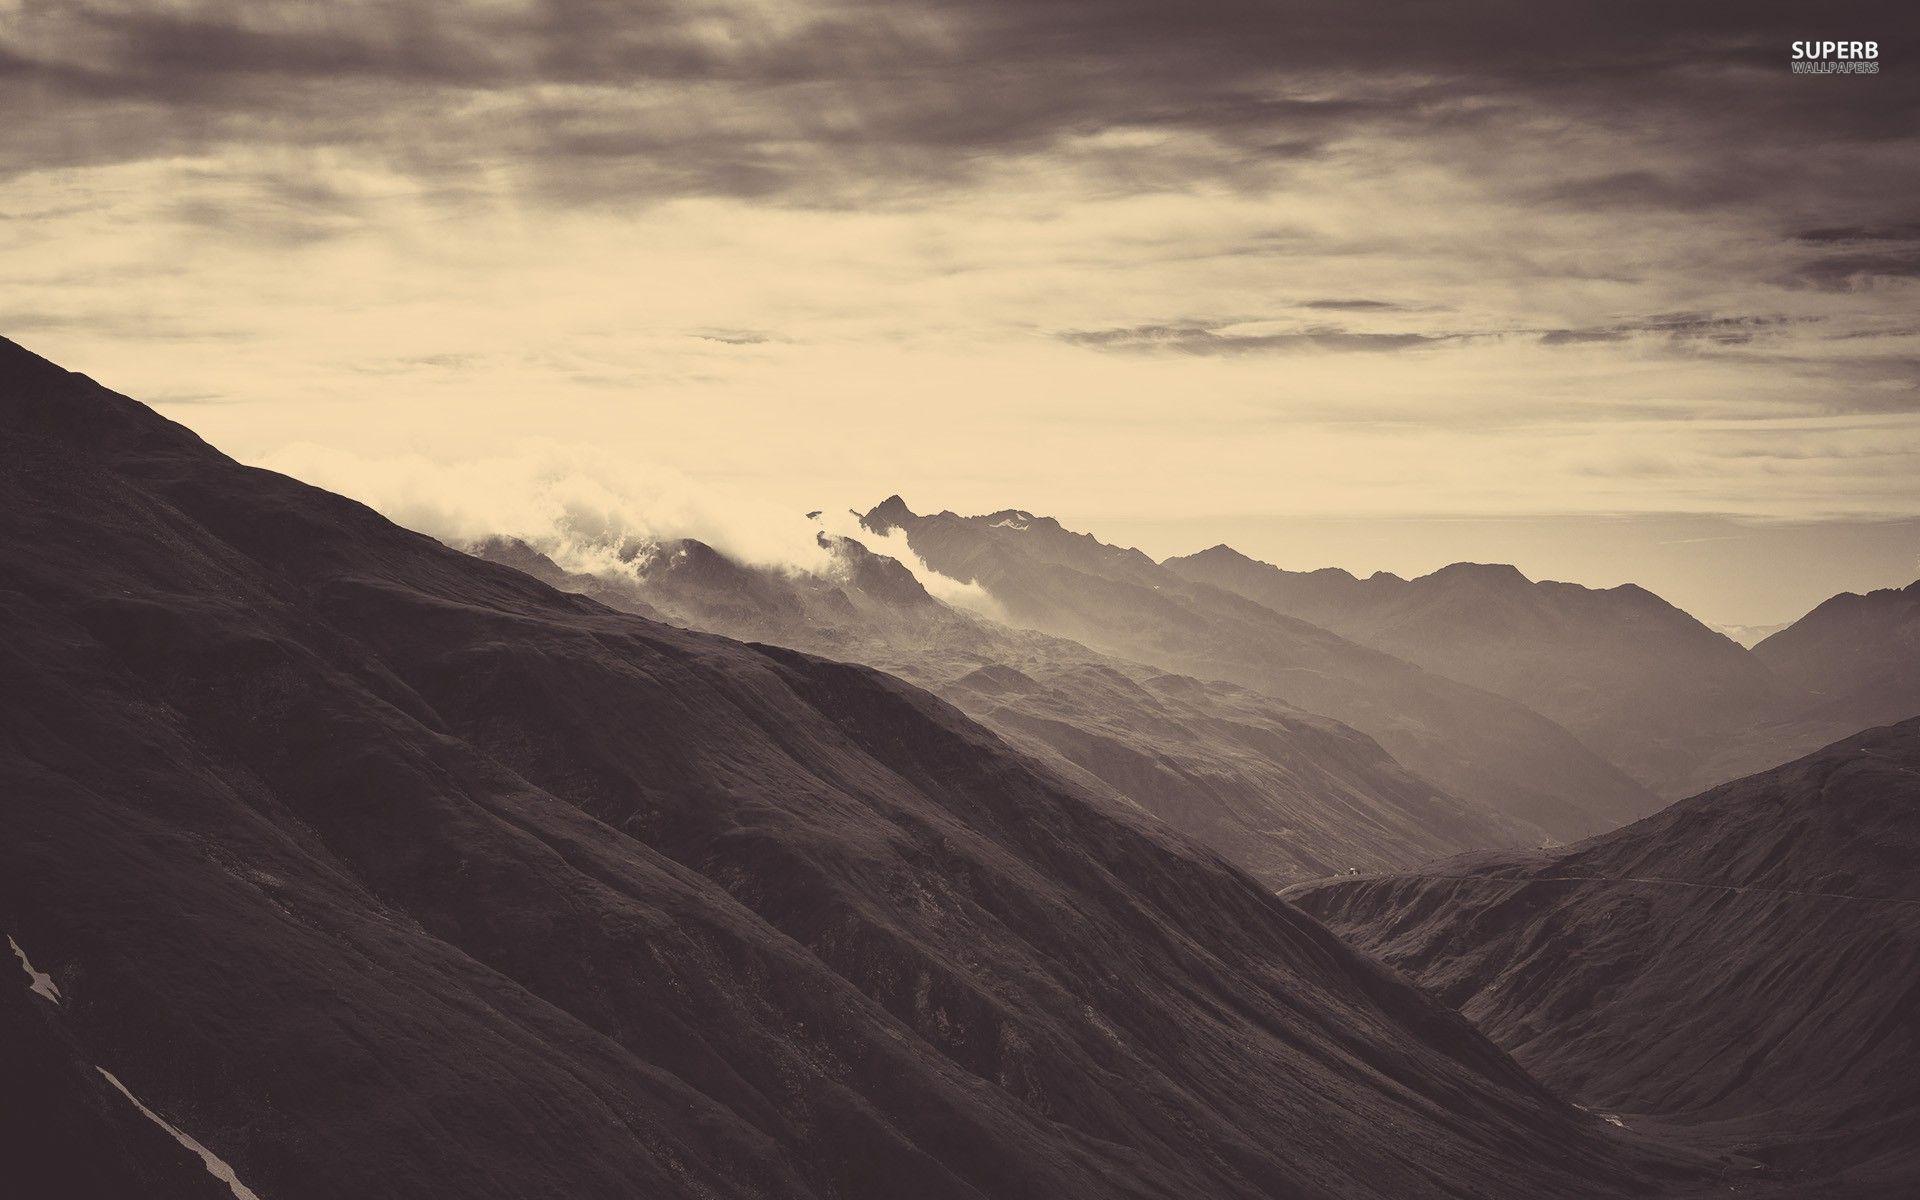 Amazing Wallpaper Mountain Blurry - d0cd9f4b95494a17b42c2f0cef6c914c  Trends_866551.jpg